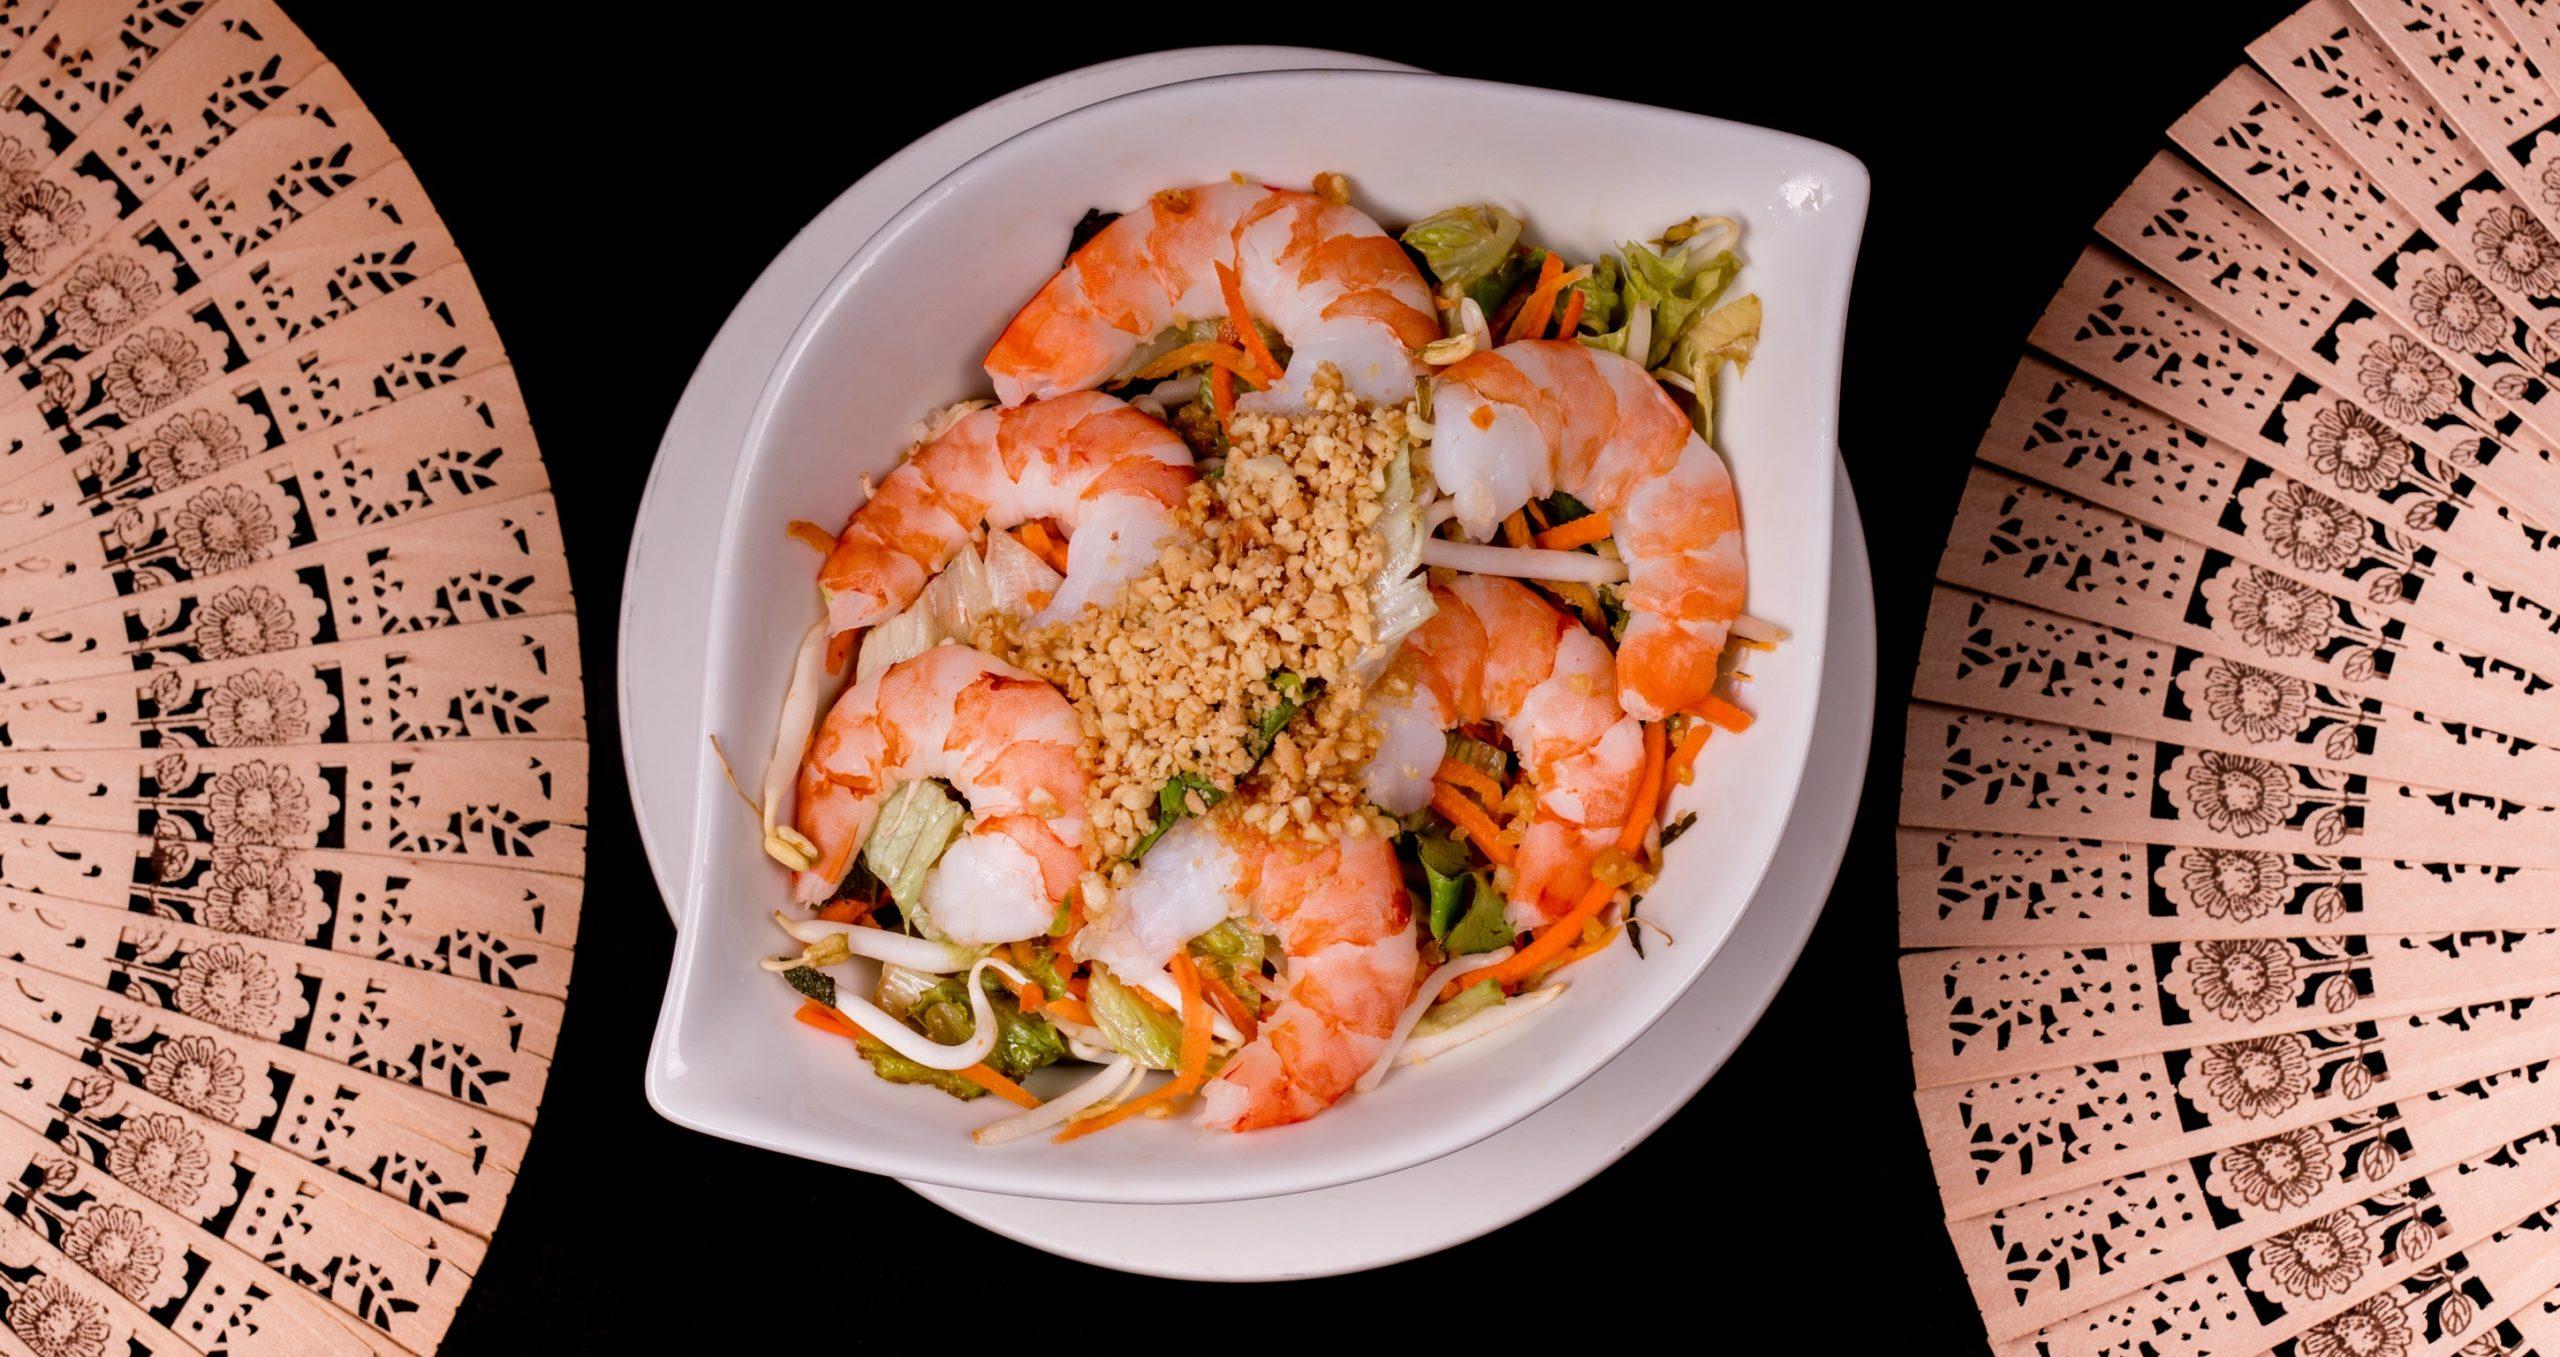 蝦片沙拉   Salade de crevettes